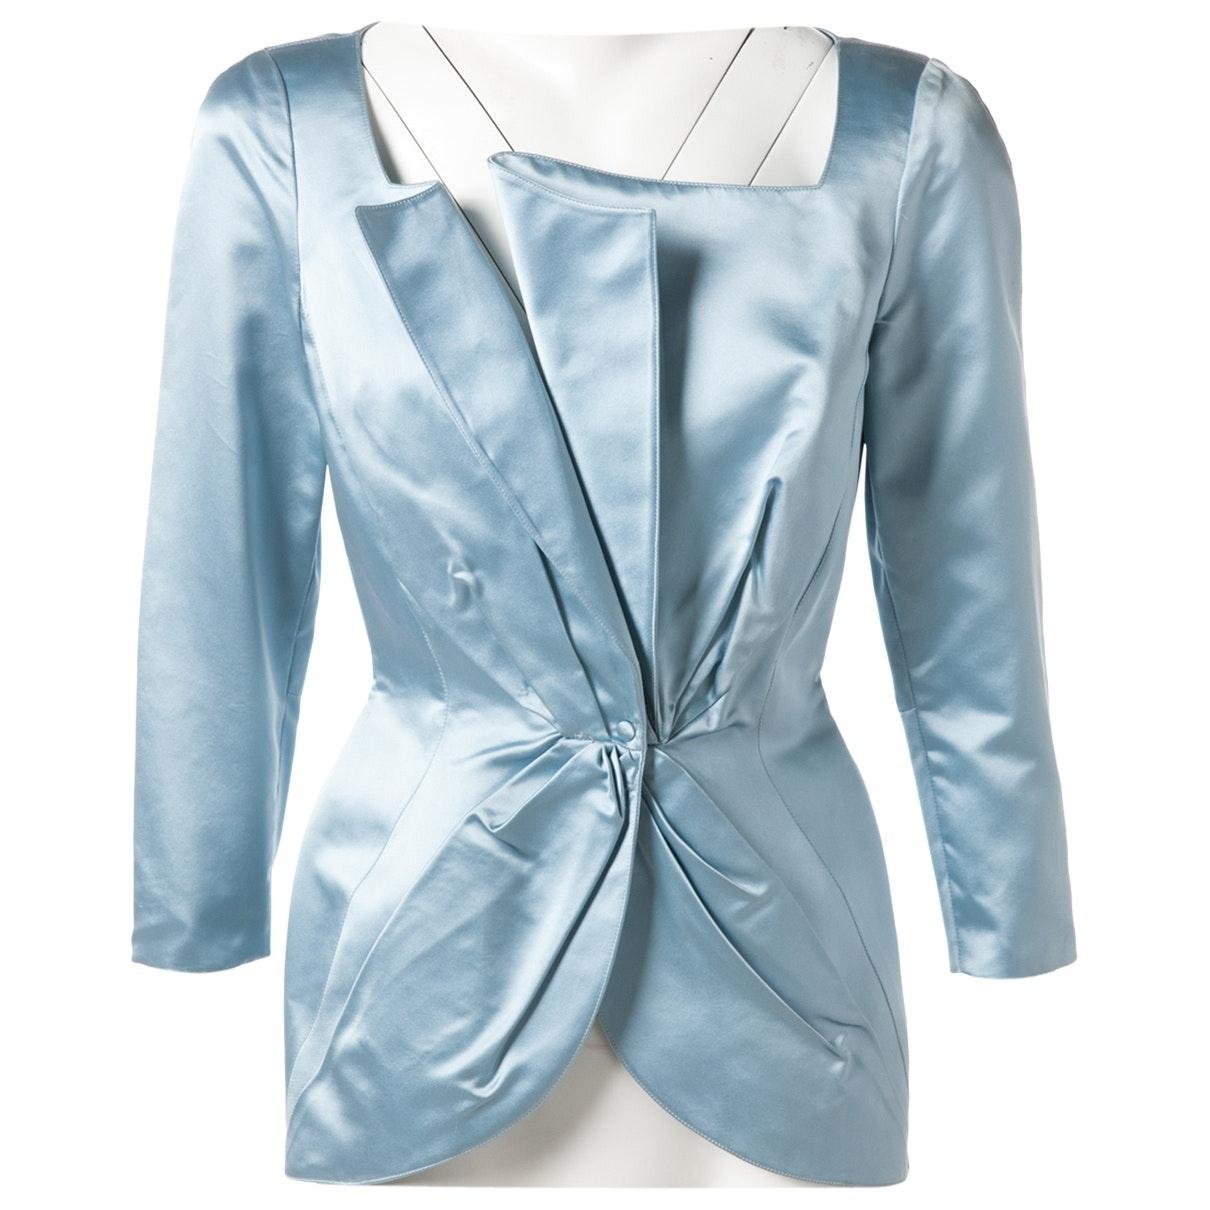 THIERRY MUGLER Blue Jacket; Size: 38 FR; $412.14